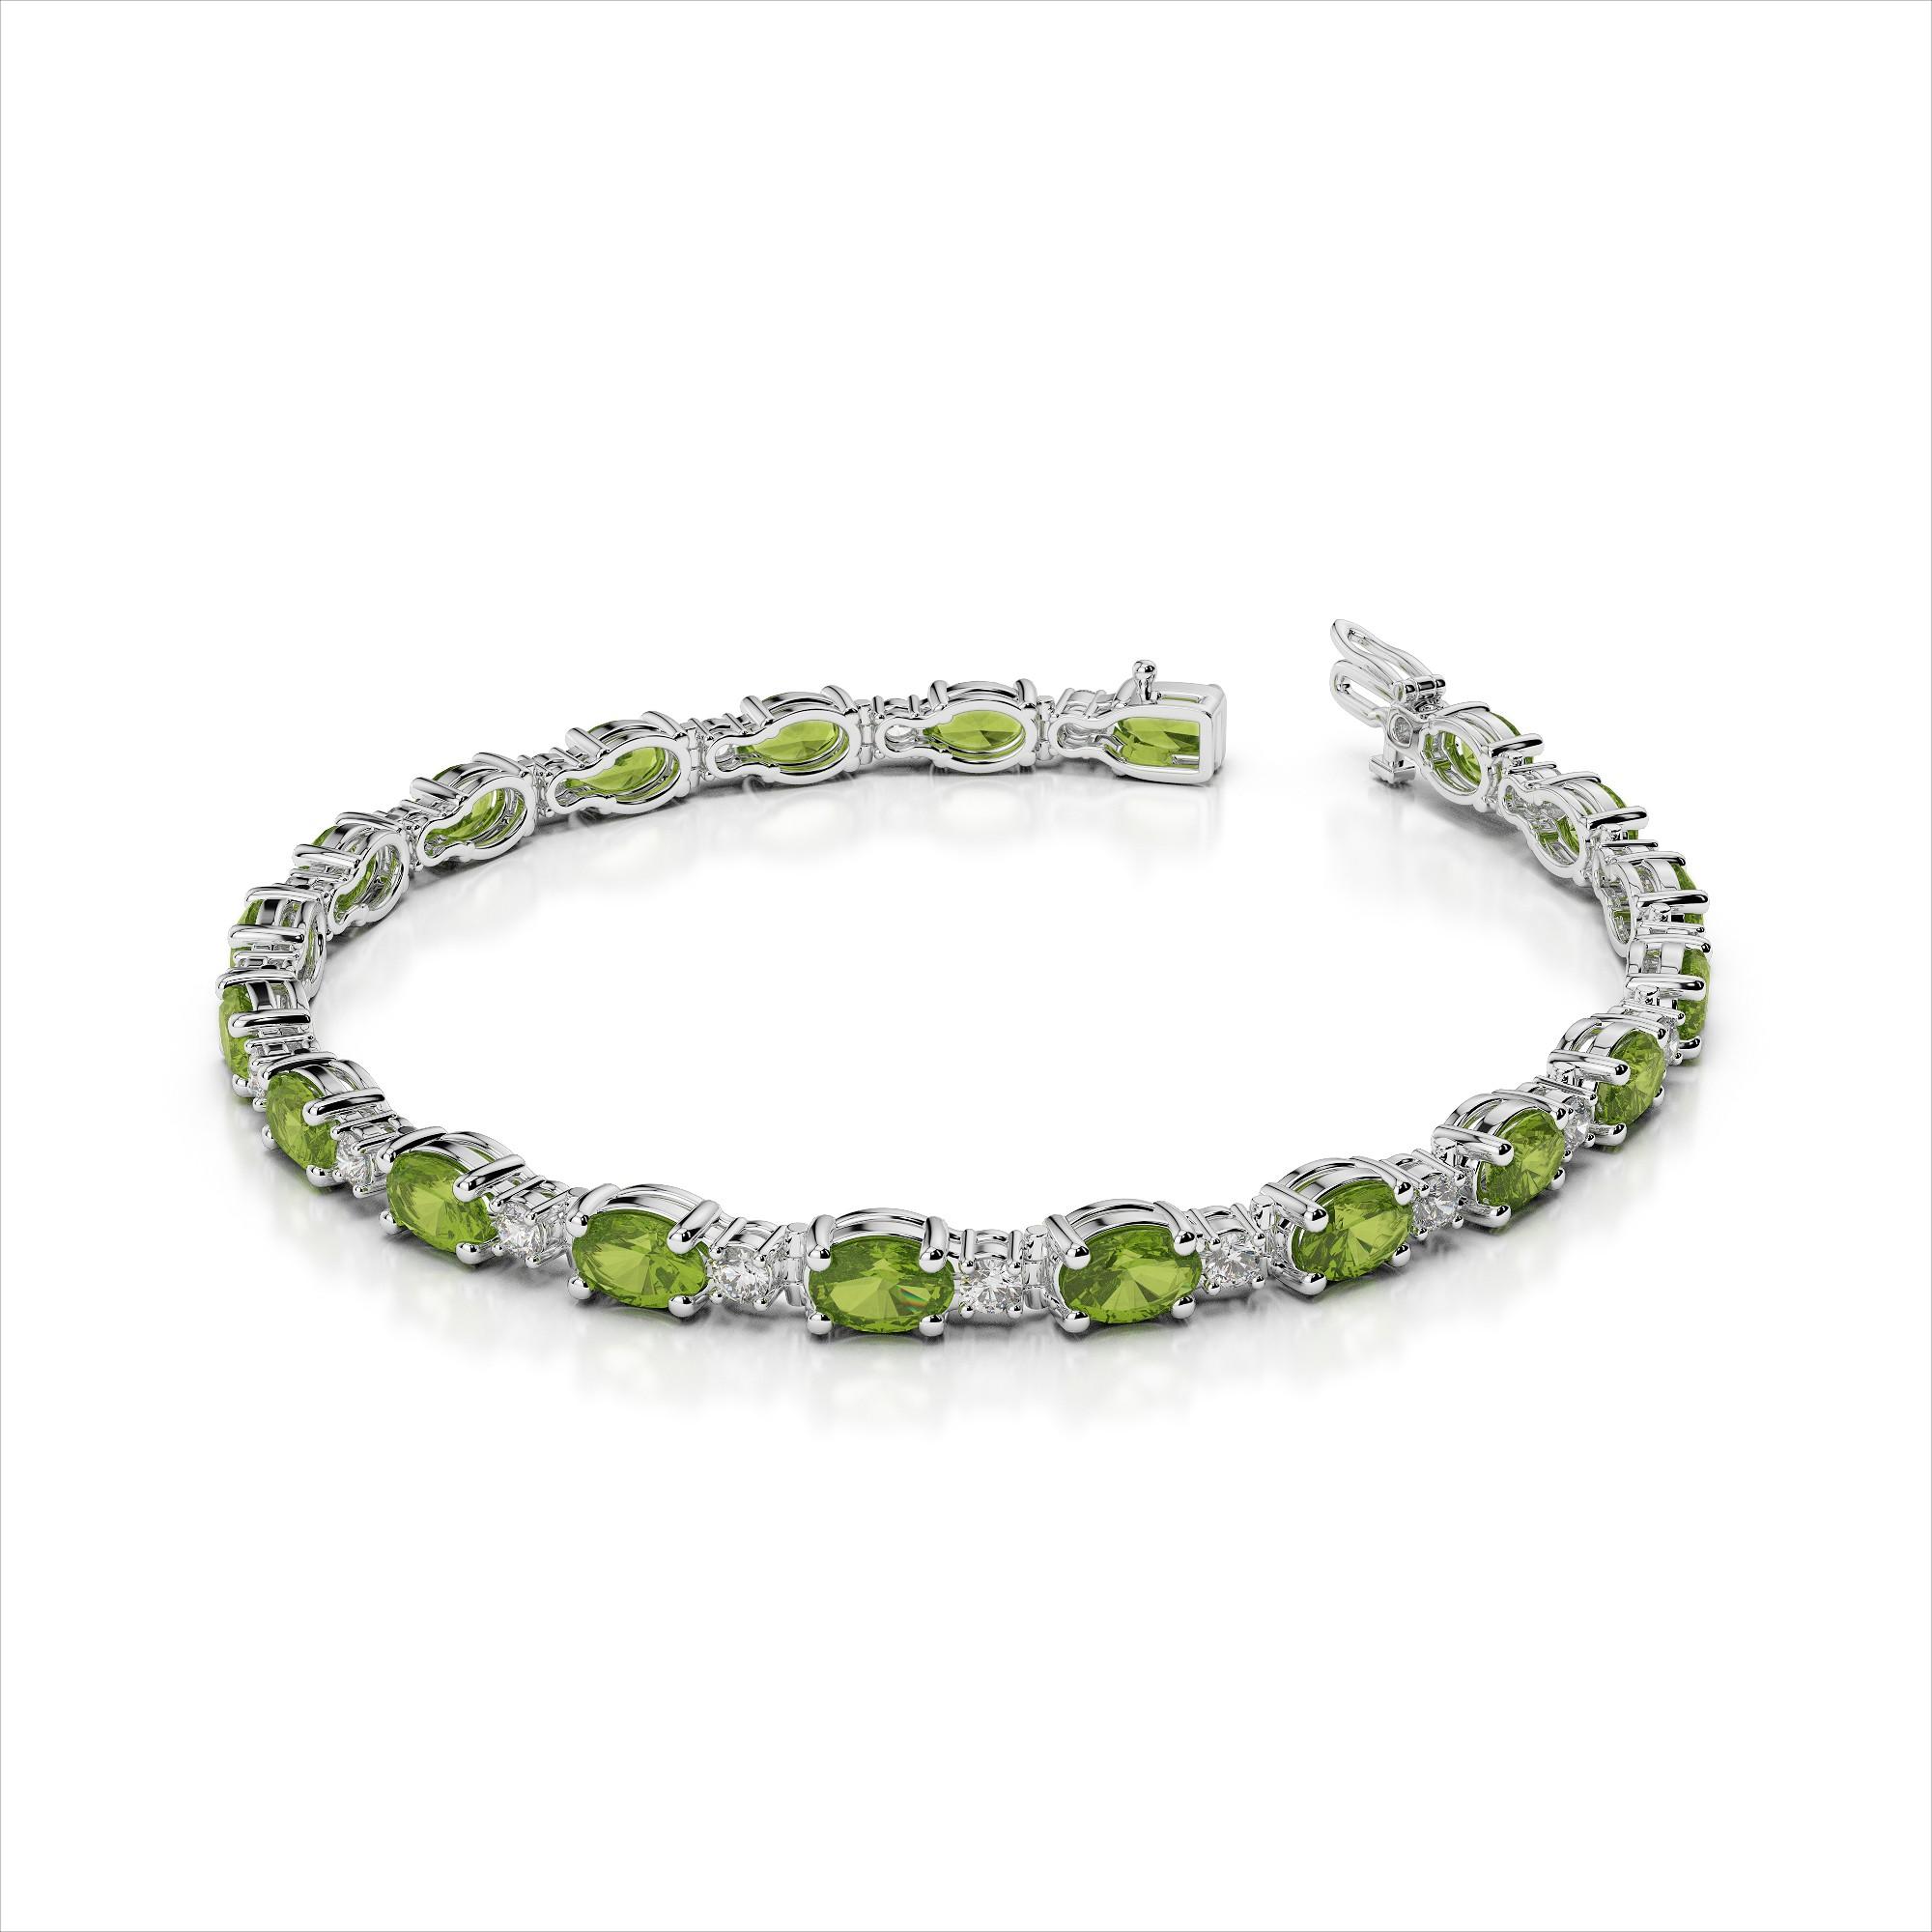 Single Diamond and 5x3mm Oval Gemstone Bracelet